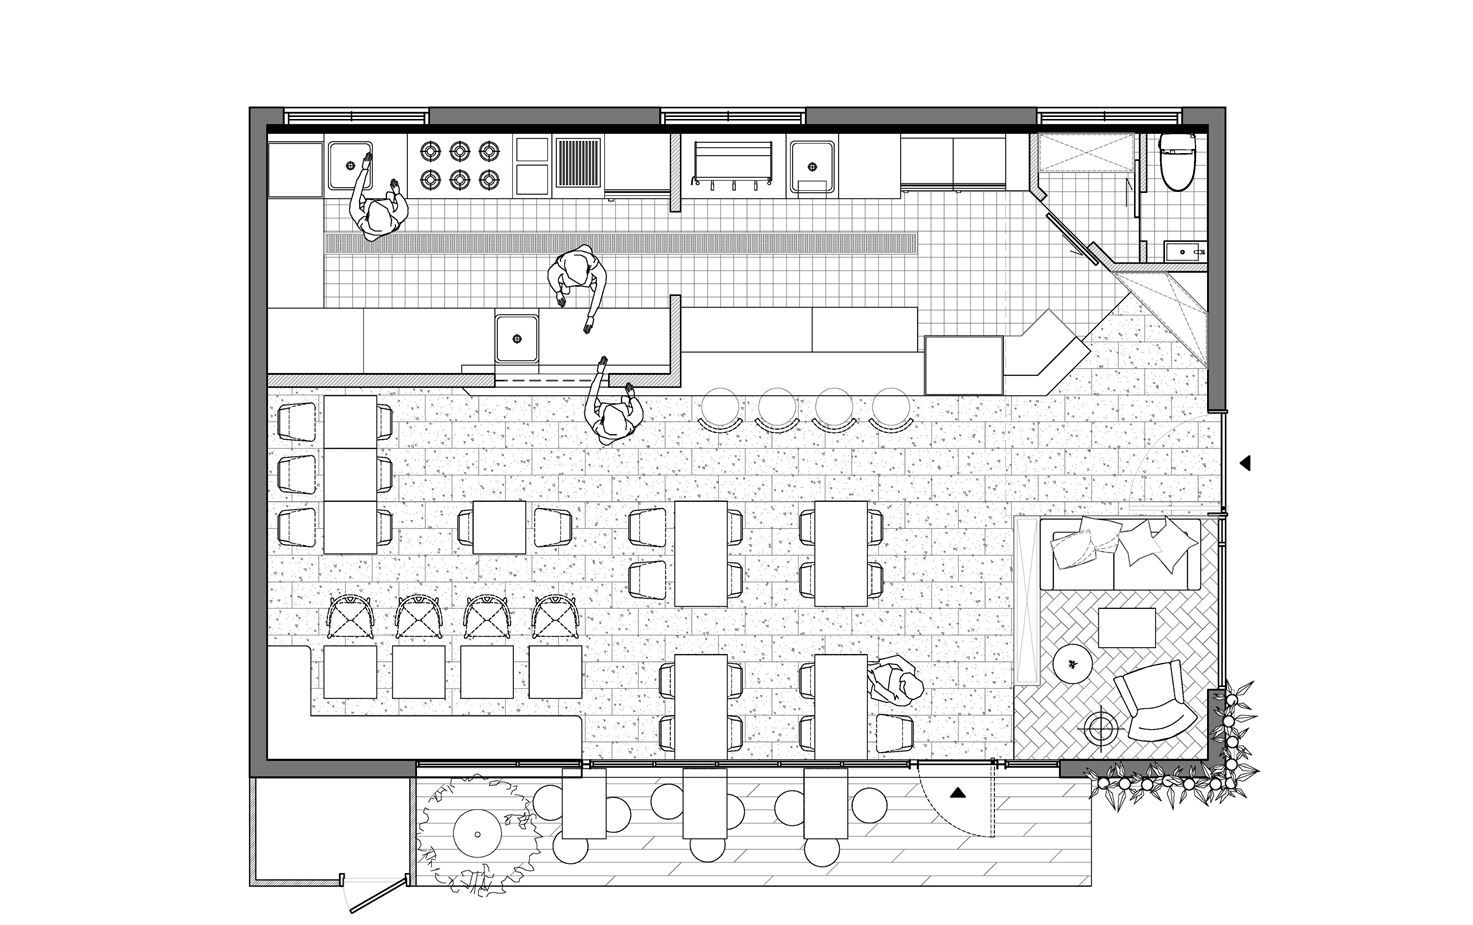 Piccola Botega Picture Gallery Restaurant Floor Plan Restaurant Plan Restaurant Layout